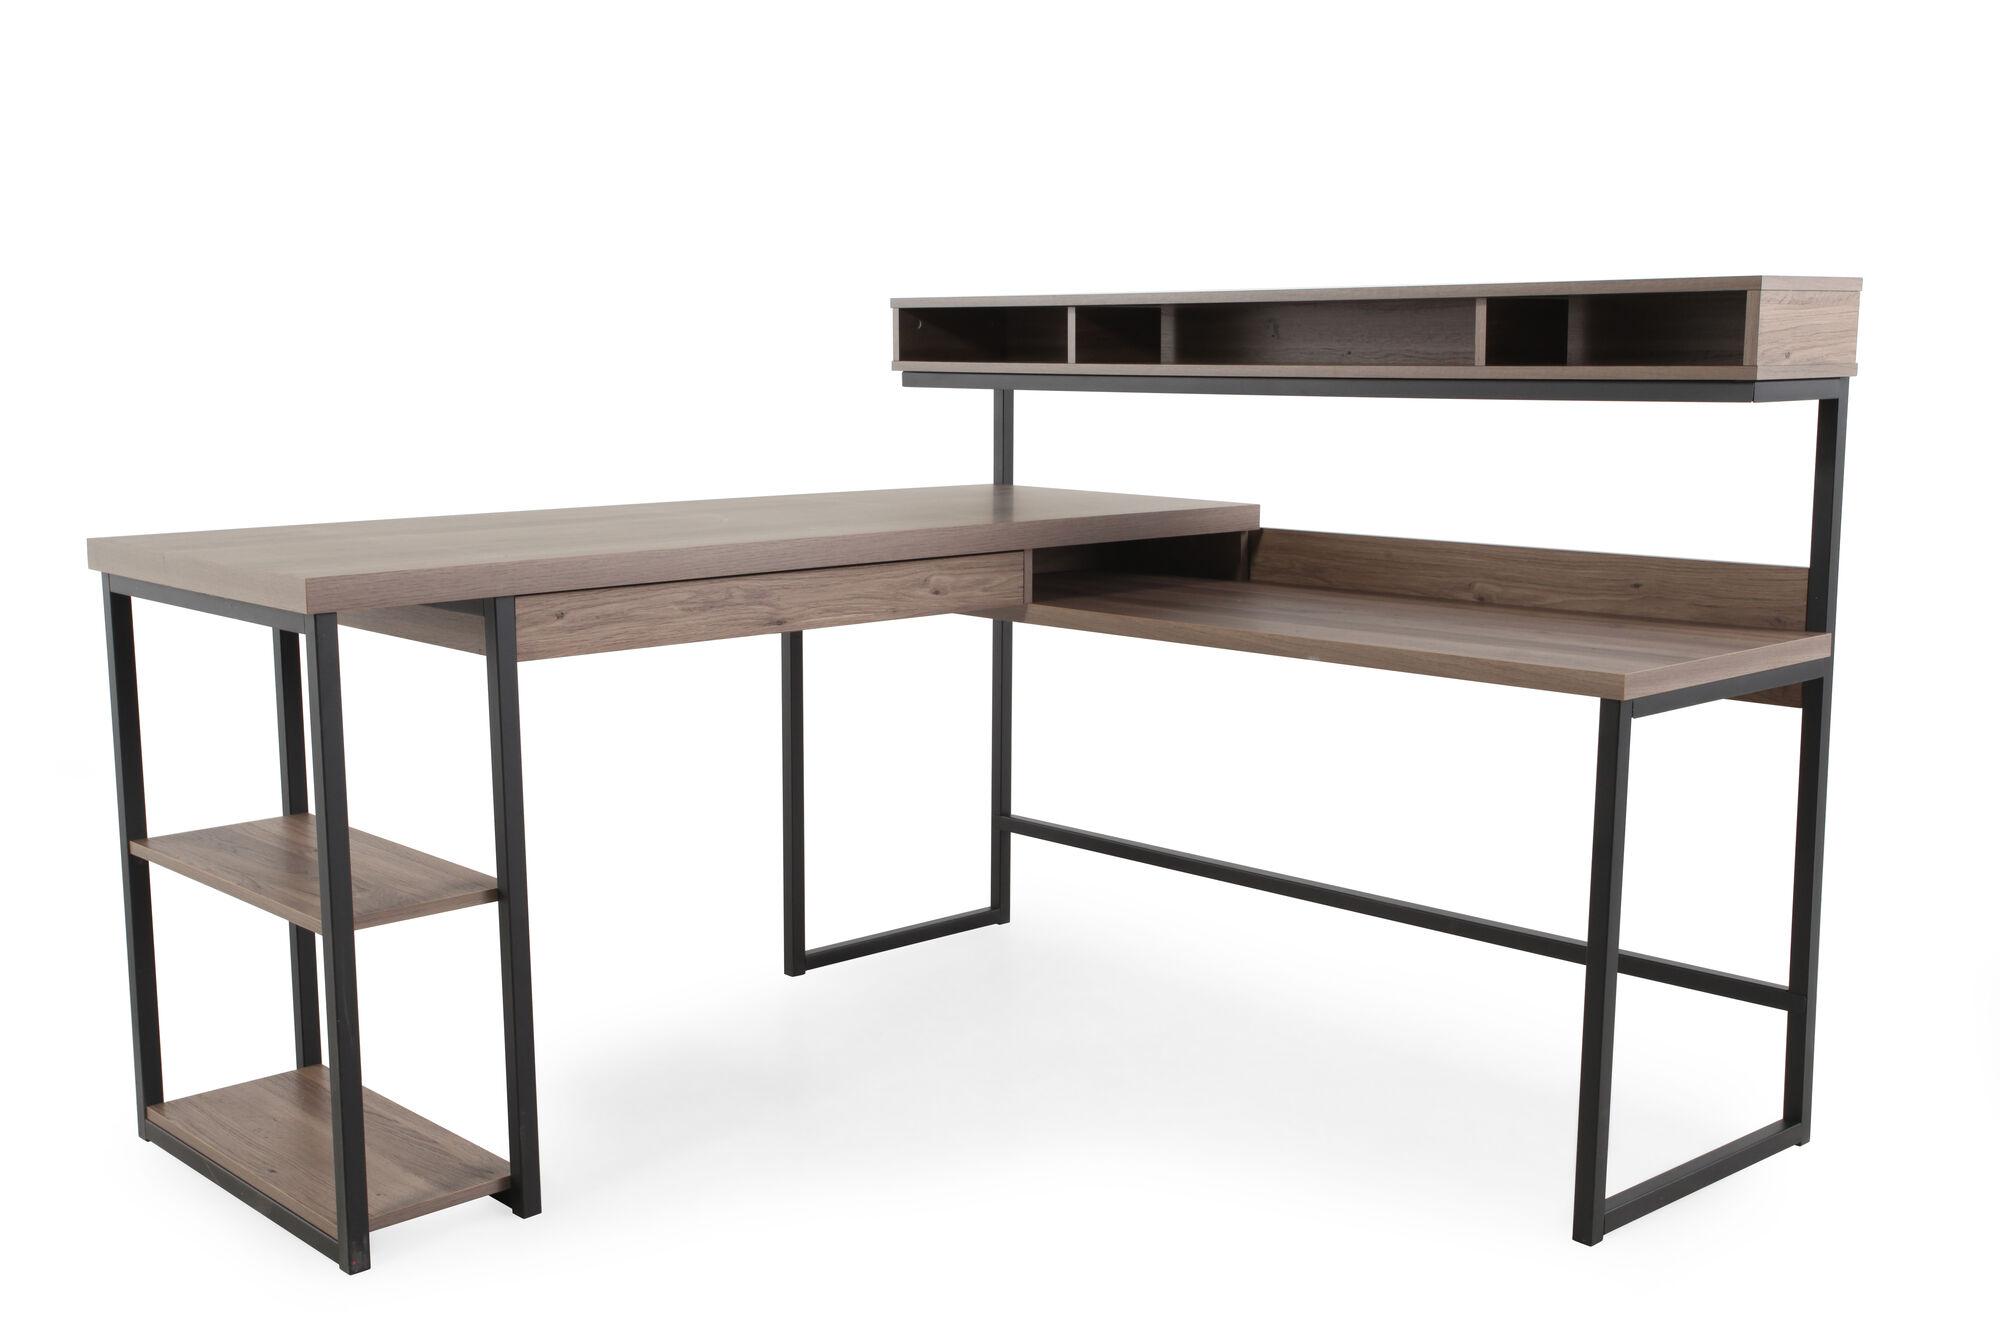 "Home Office Furniture At Wooden Furniture Store: 61"" Casual L-Shaped Desk In Salt Oak"